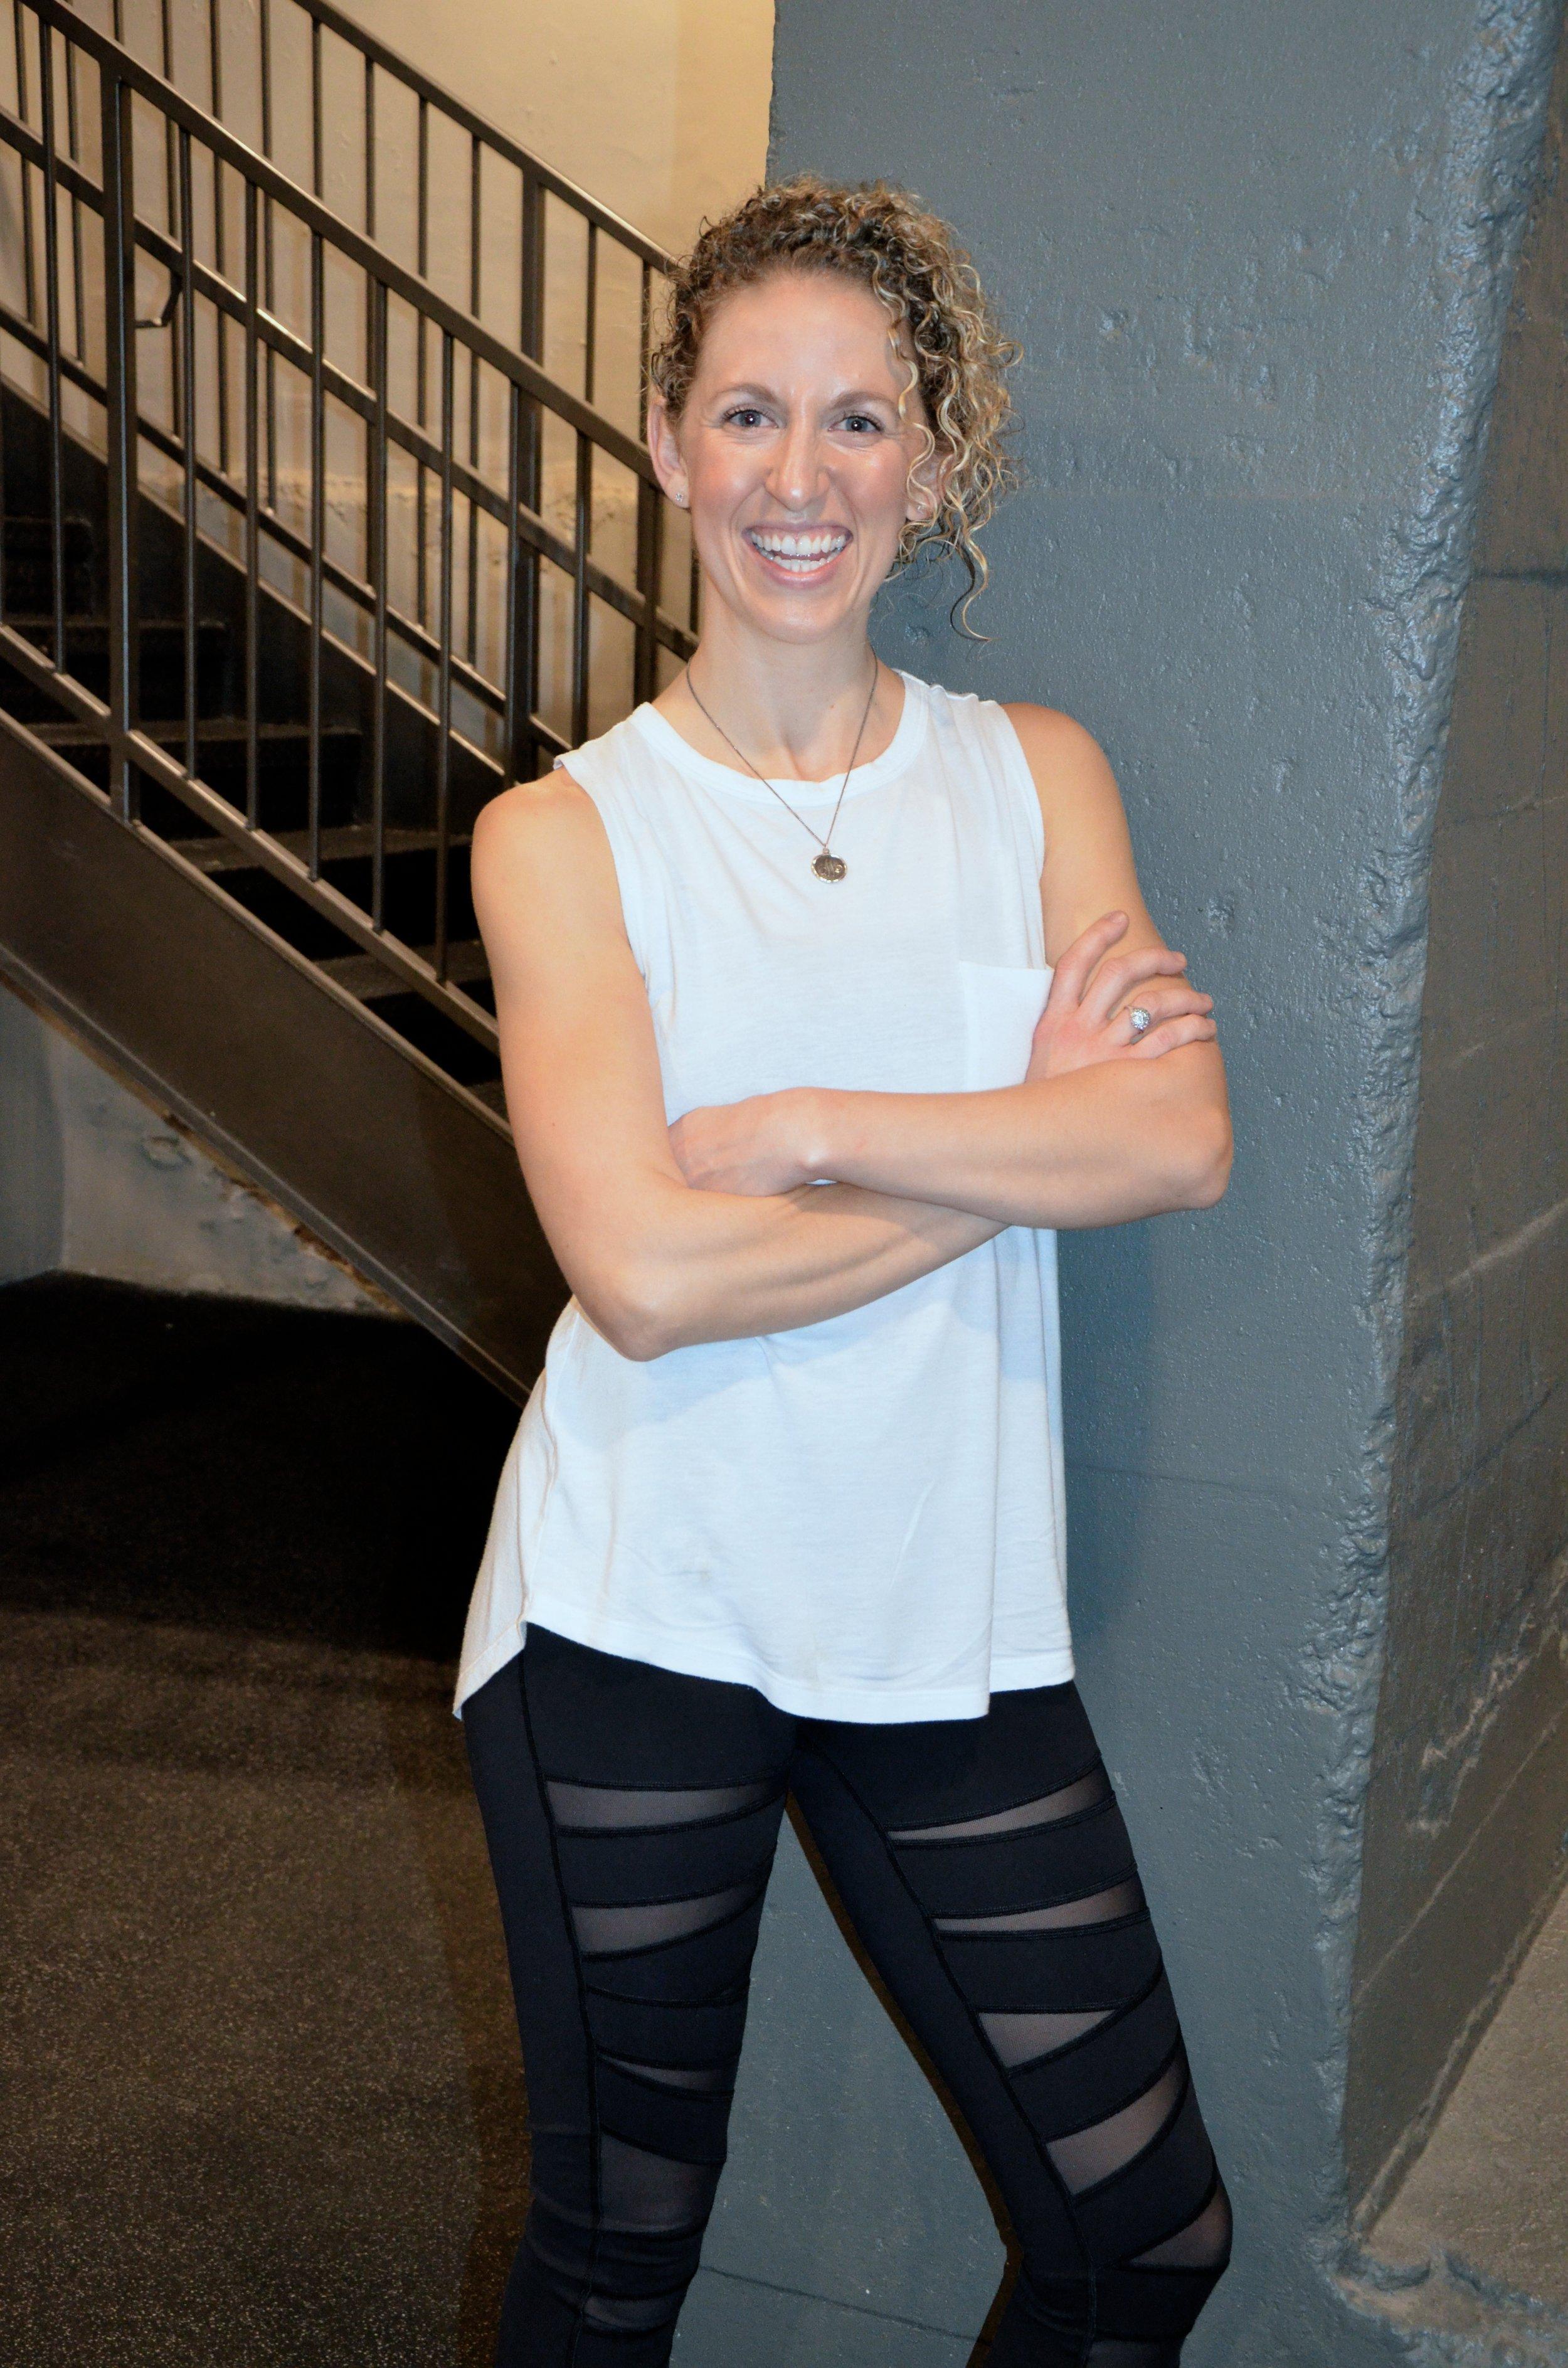 dance fitness class, similar to zumba, in dayton, ohio